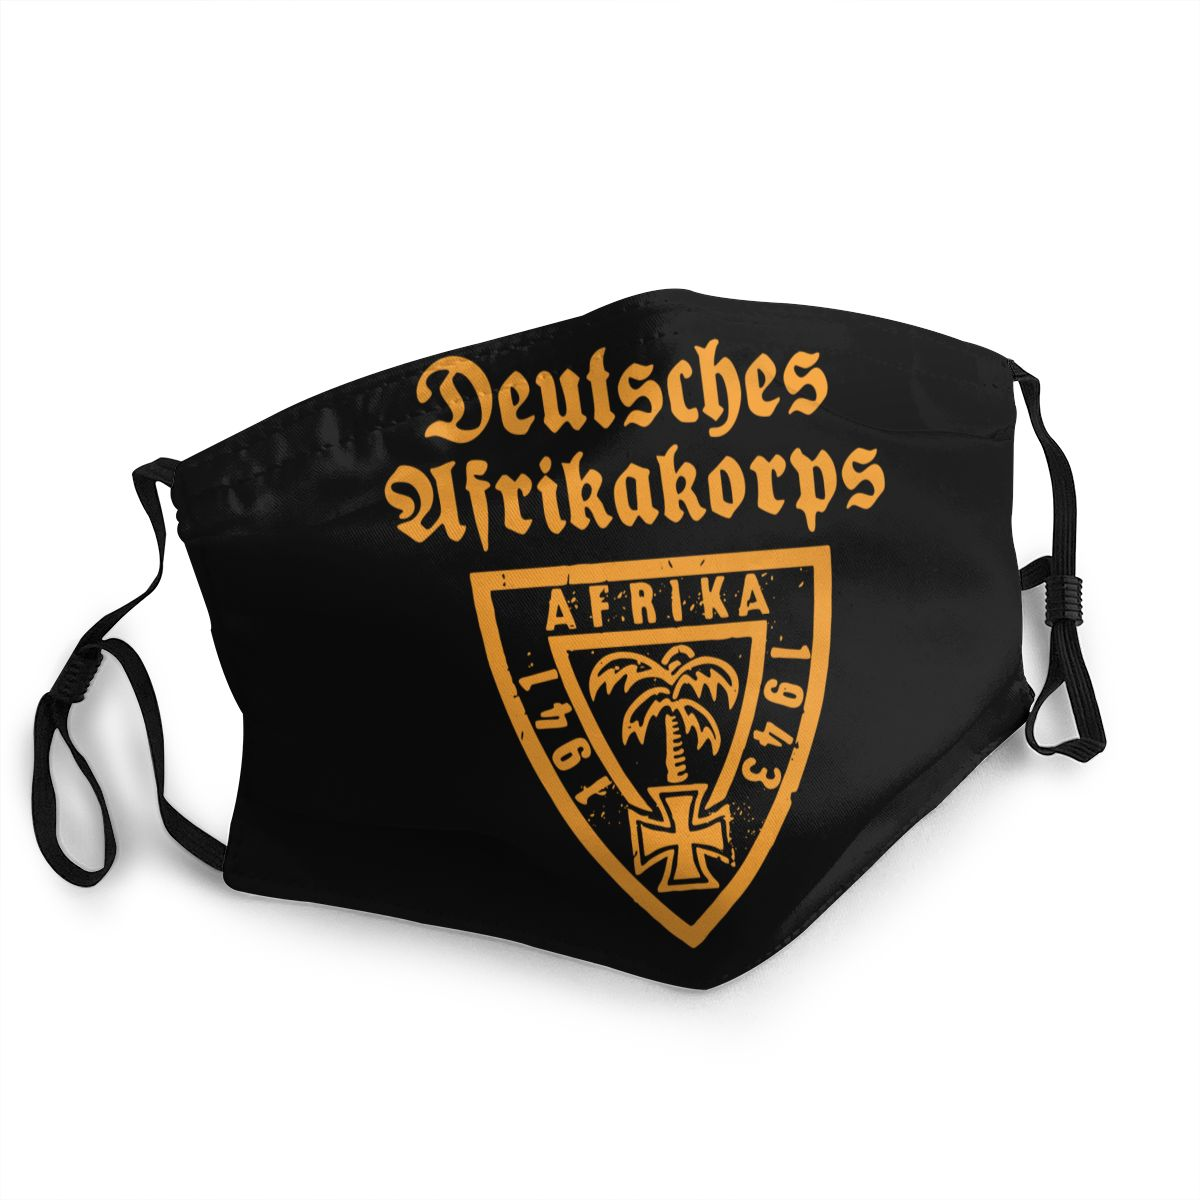 Deutsches Afrikakorps DAK Emblem Wehrmacht Reusable Face Mask Panzer Anti Haze Dustproof Protection Cover Respirator